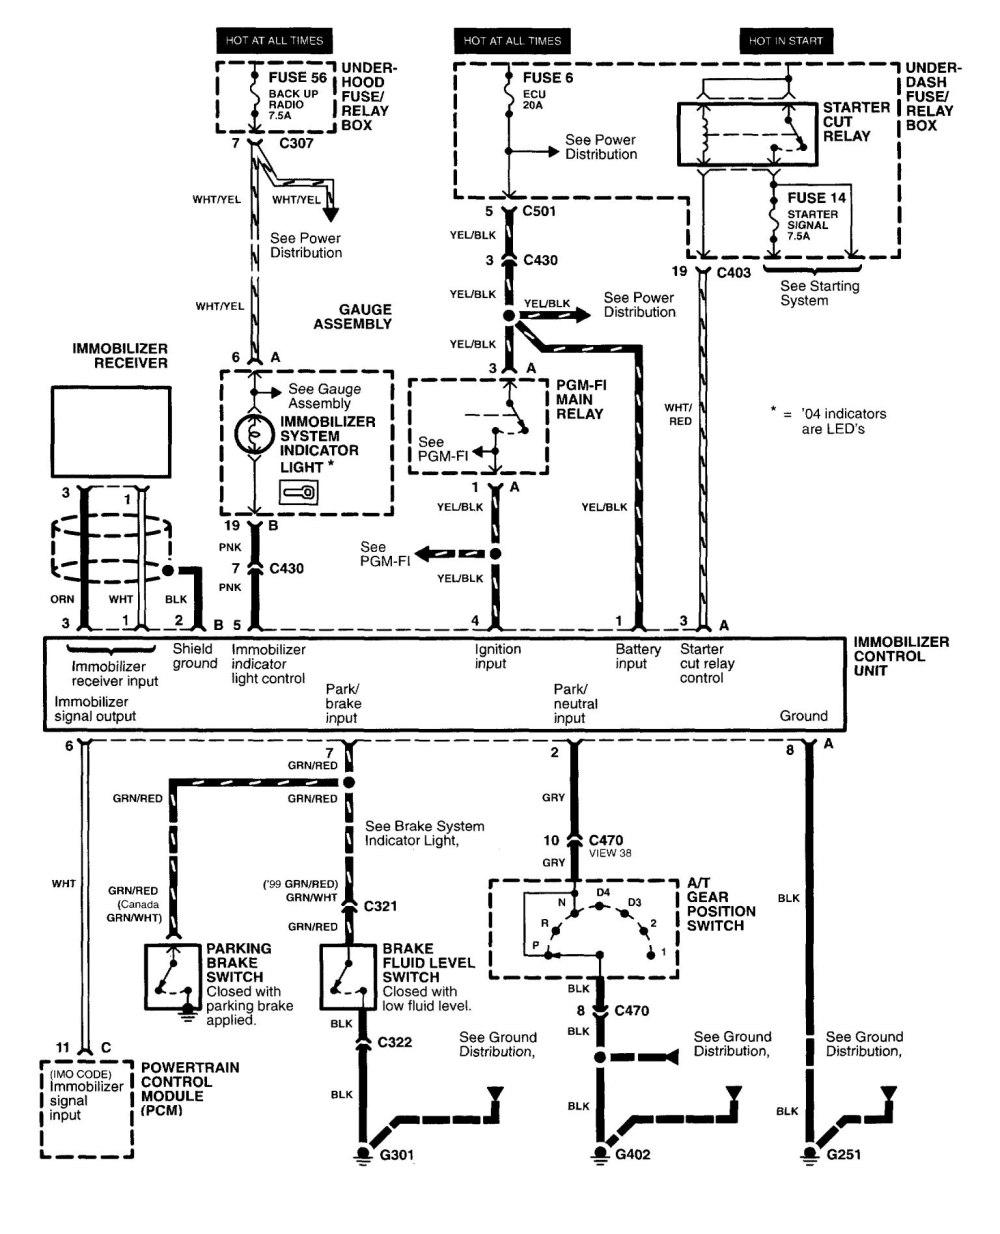 medium resolution of 1997 acura slx fuse box location 1997 honda civic fuse box 2009 ford expedition fuse diagram